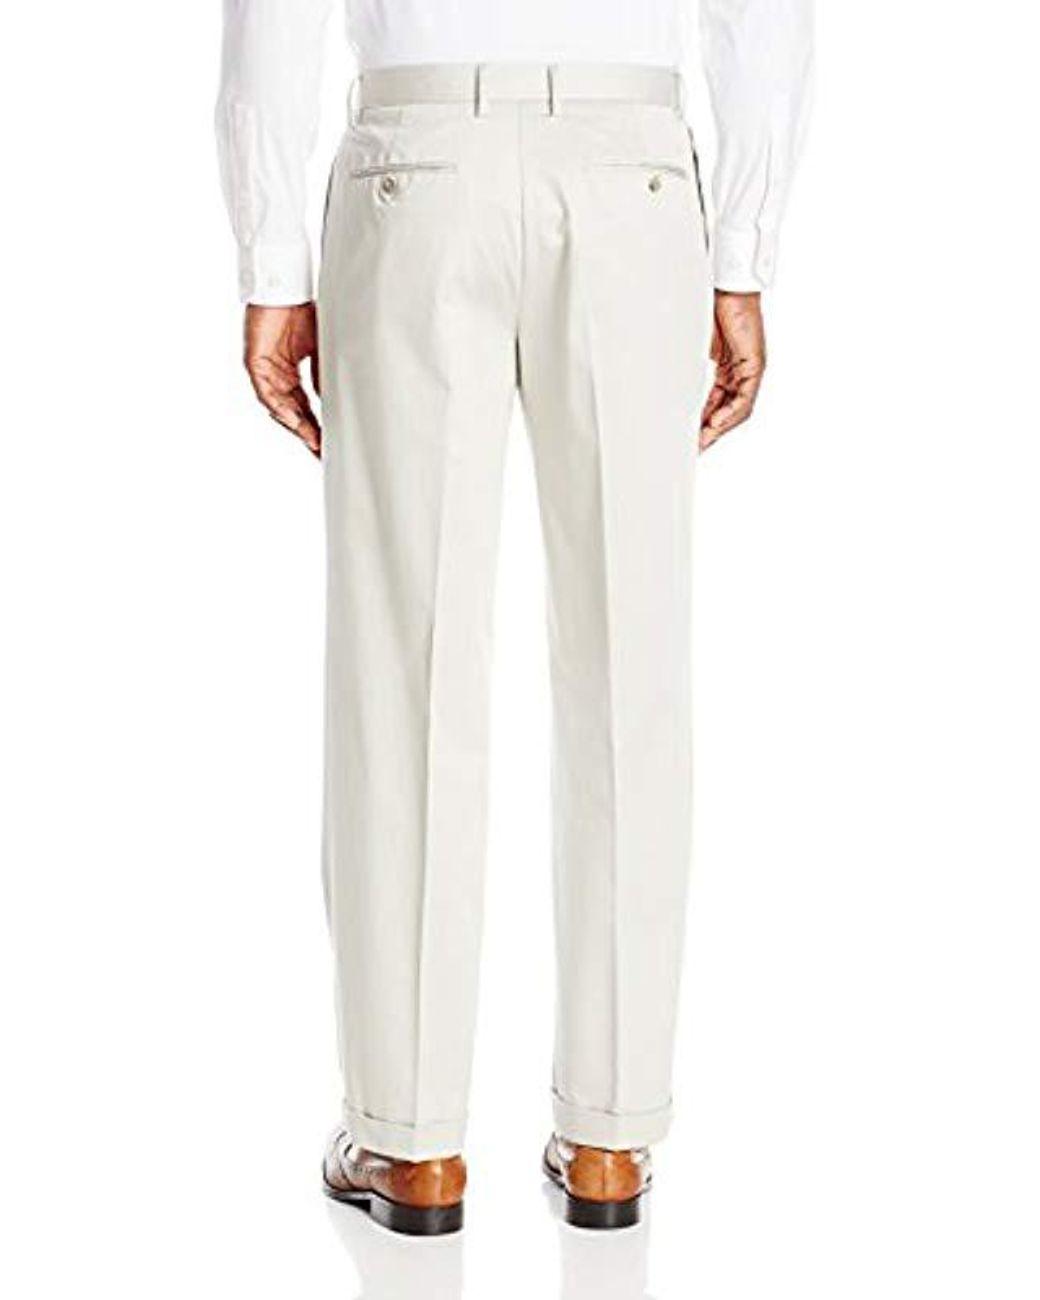 cbd815ef4327f Dockers Insignia Wrinkle-free Khaki Classic-fit Pleat Pant in ...